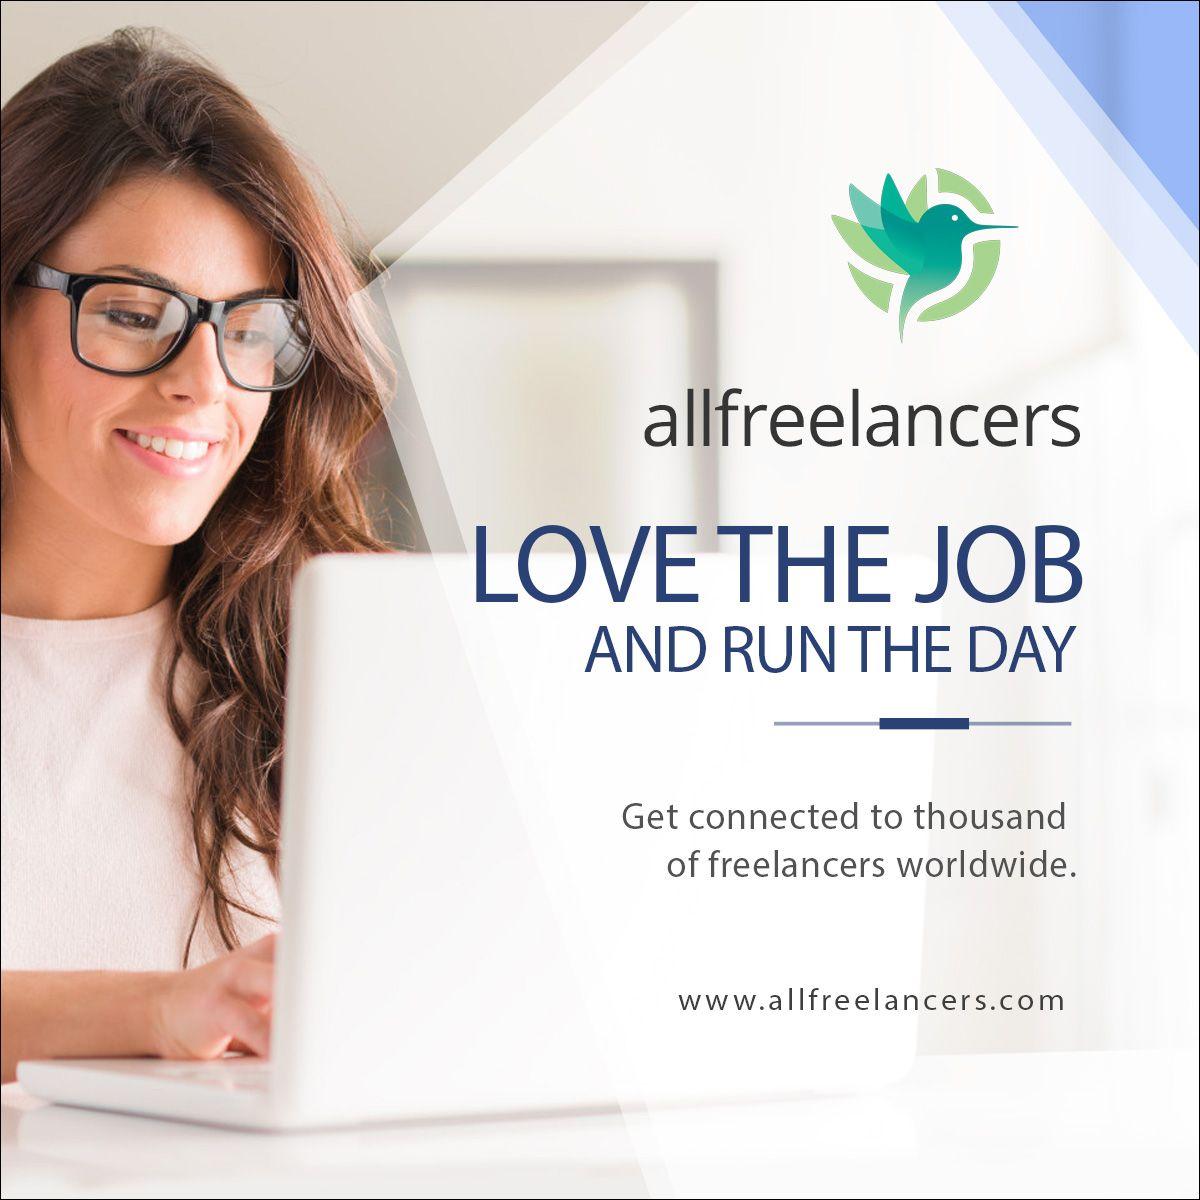 Freelancer Freelancing Freelancers Freelancelife Workfromhome Outsourcing Uae Philippines Newyork Australia U Online Jobs Web Development Data Entry